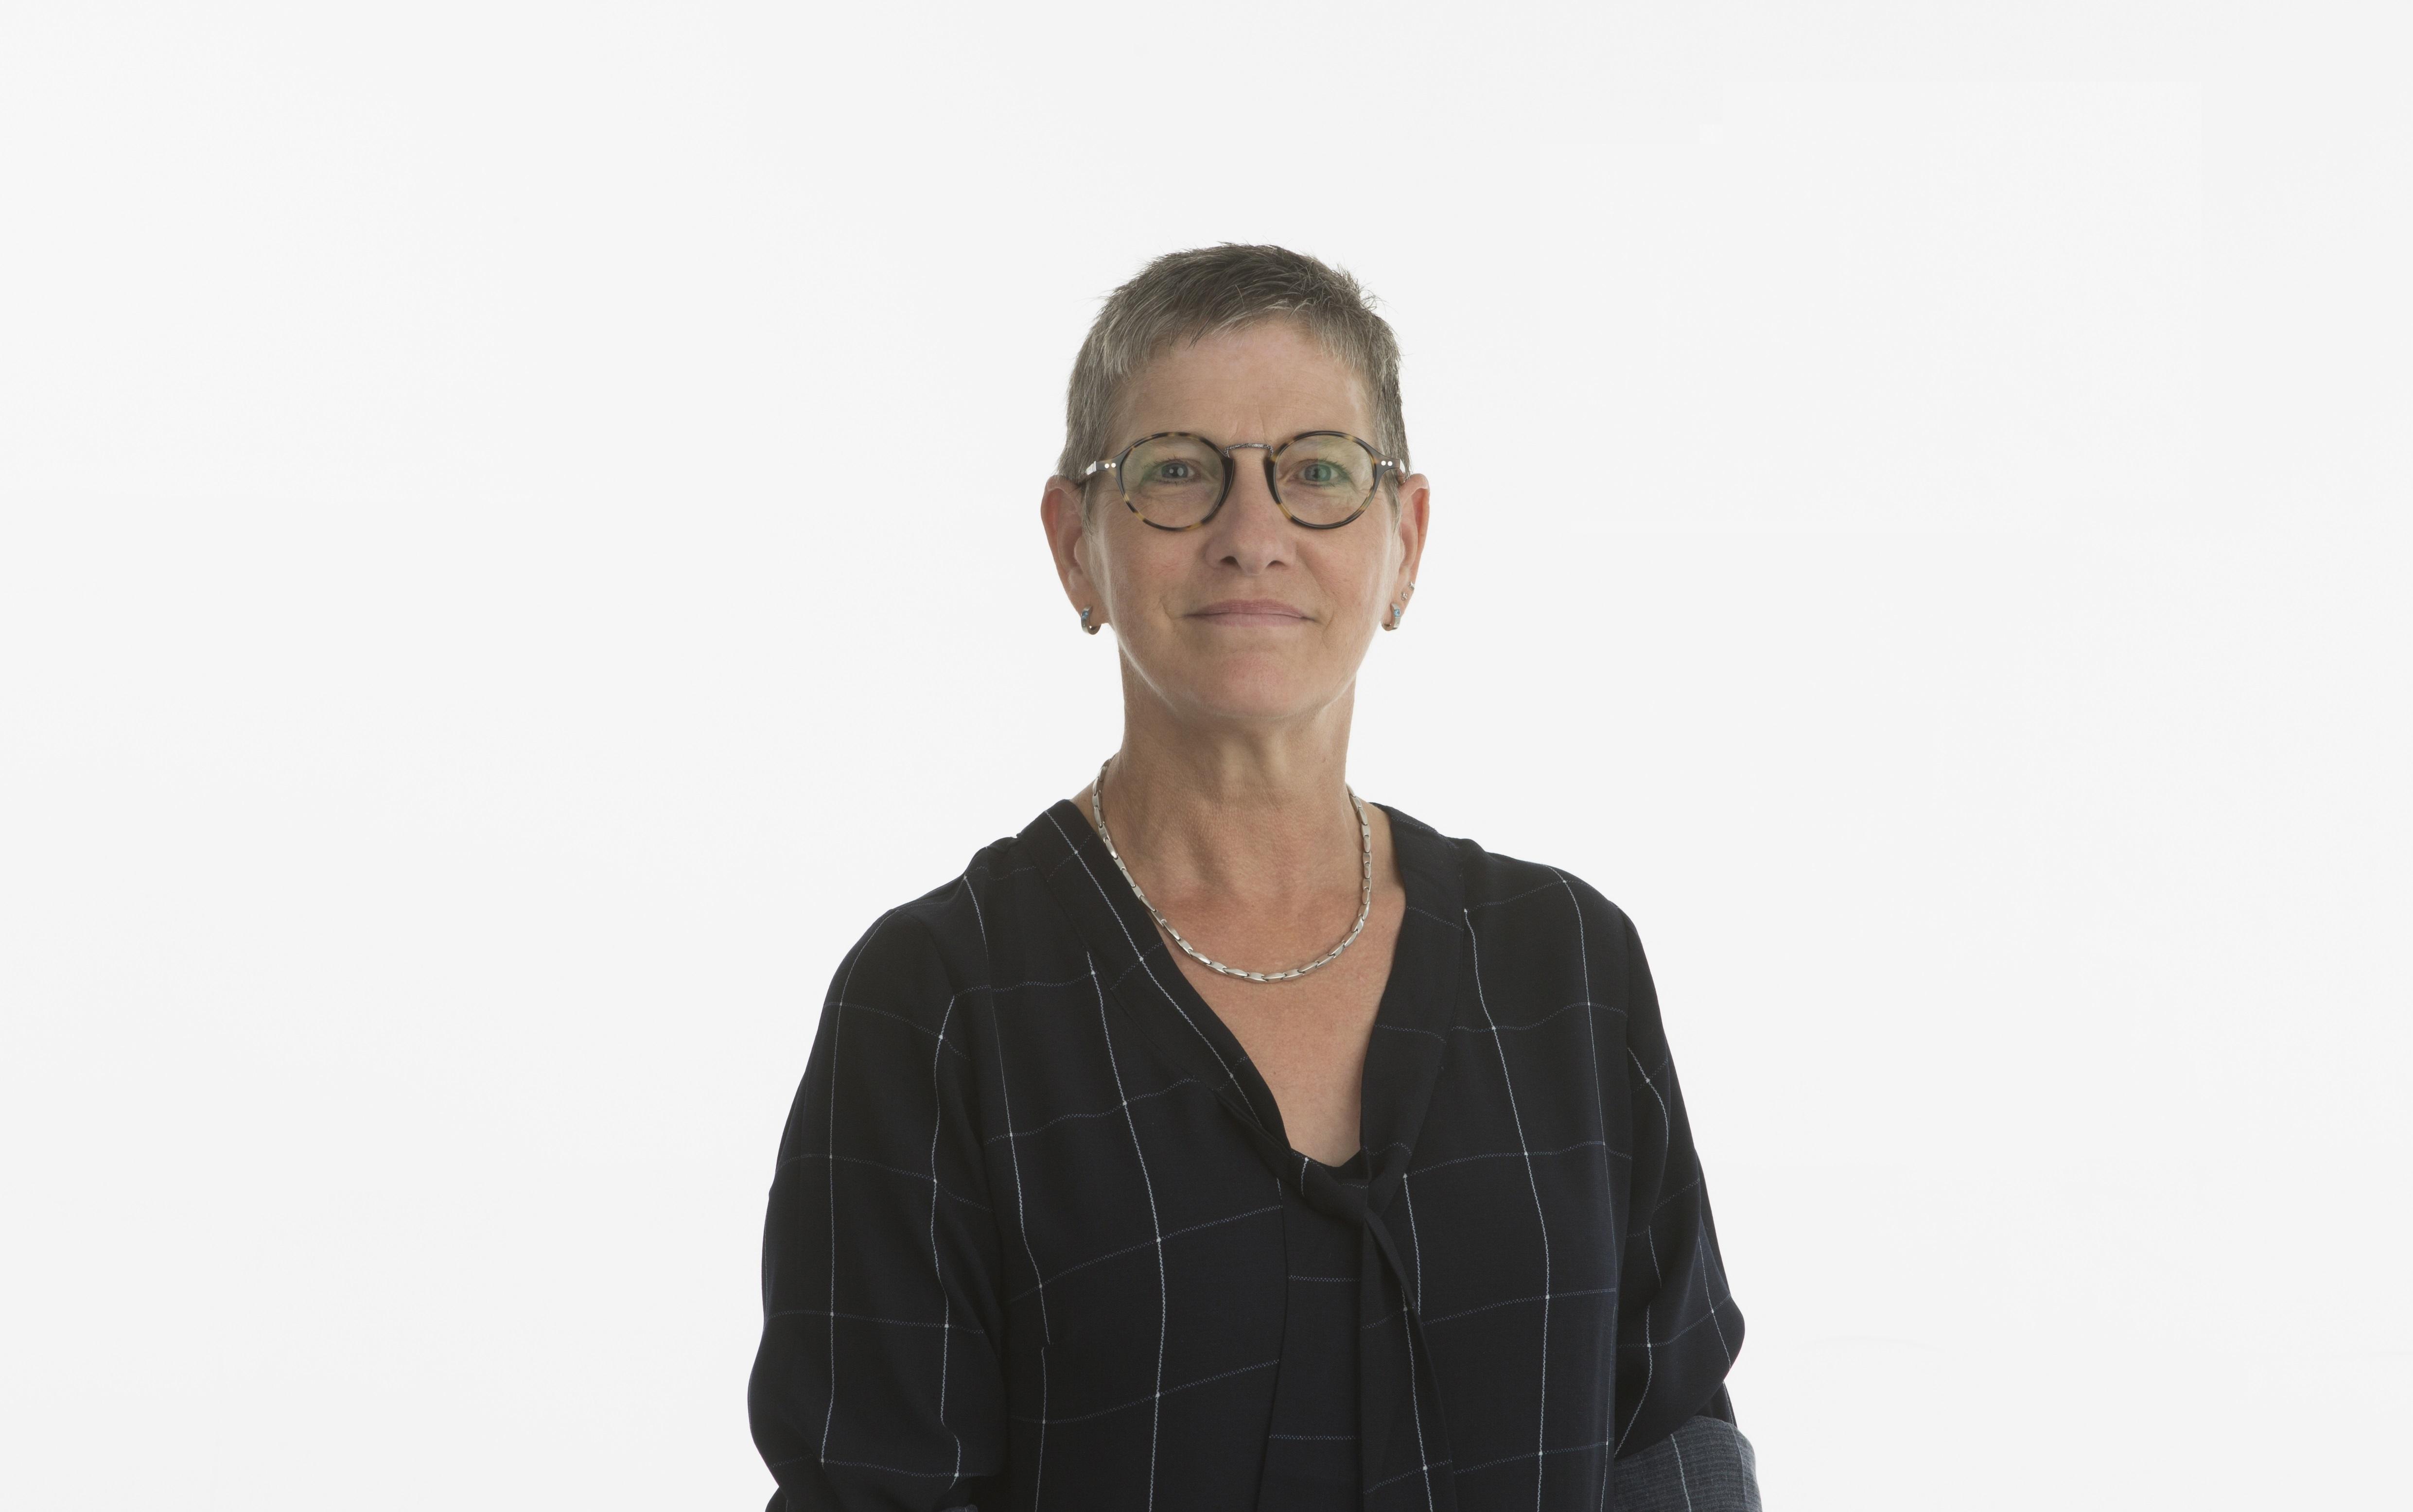 Karla Jennes